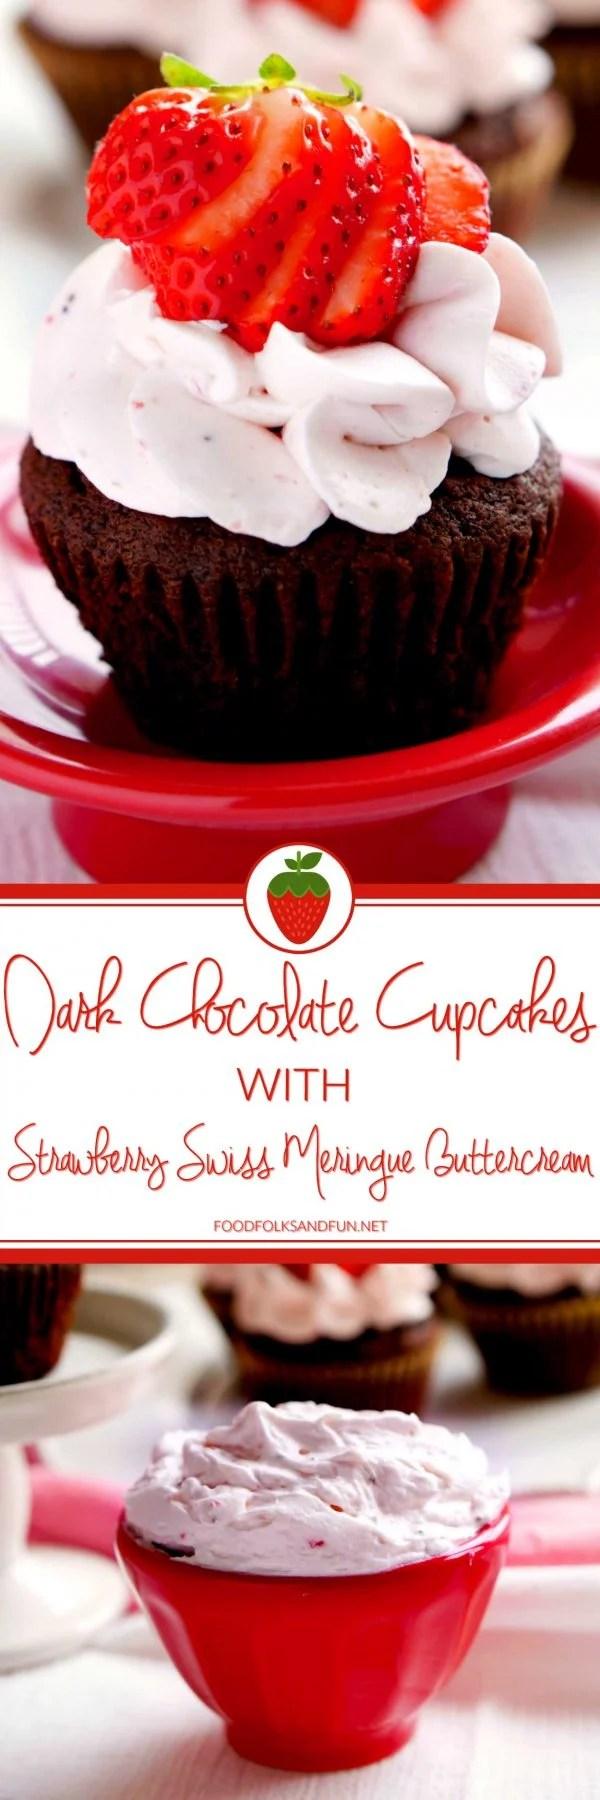 The best Dark Chocolate Cupcakes recipe with Strawberry Swiss Meringue Buttercream.